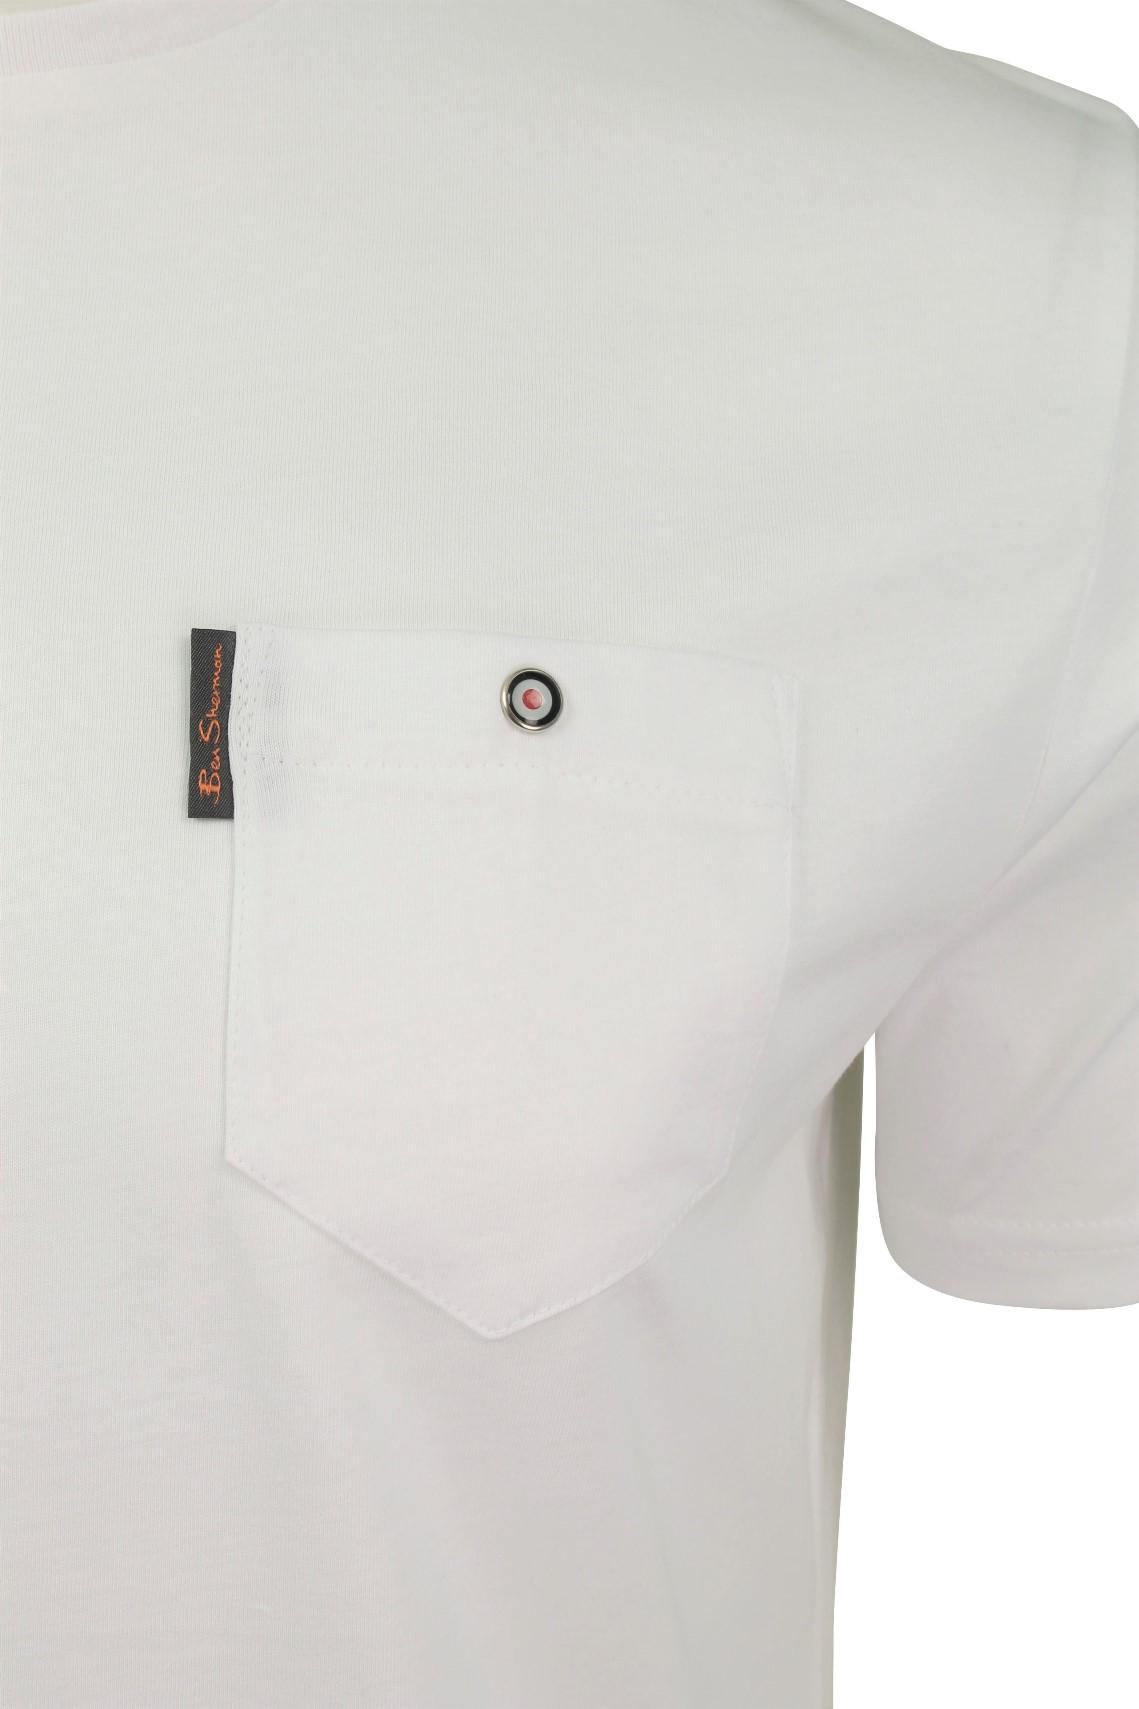 Mens-Classic-Spade-Pocket-T-Shirt-by-Ben-Sherman thumbnail 33